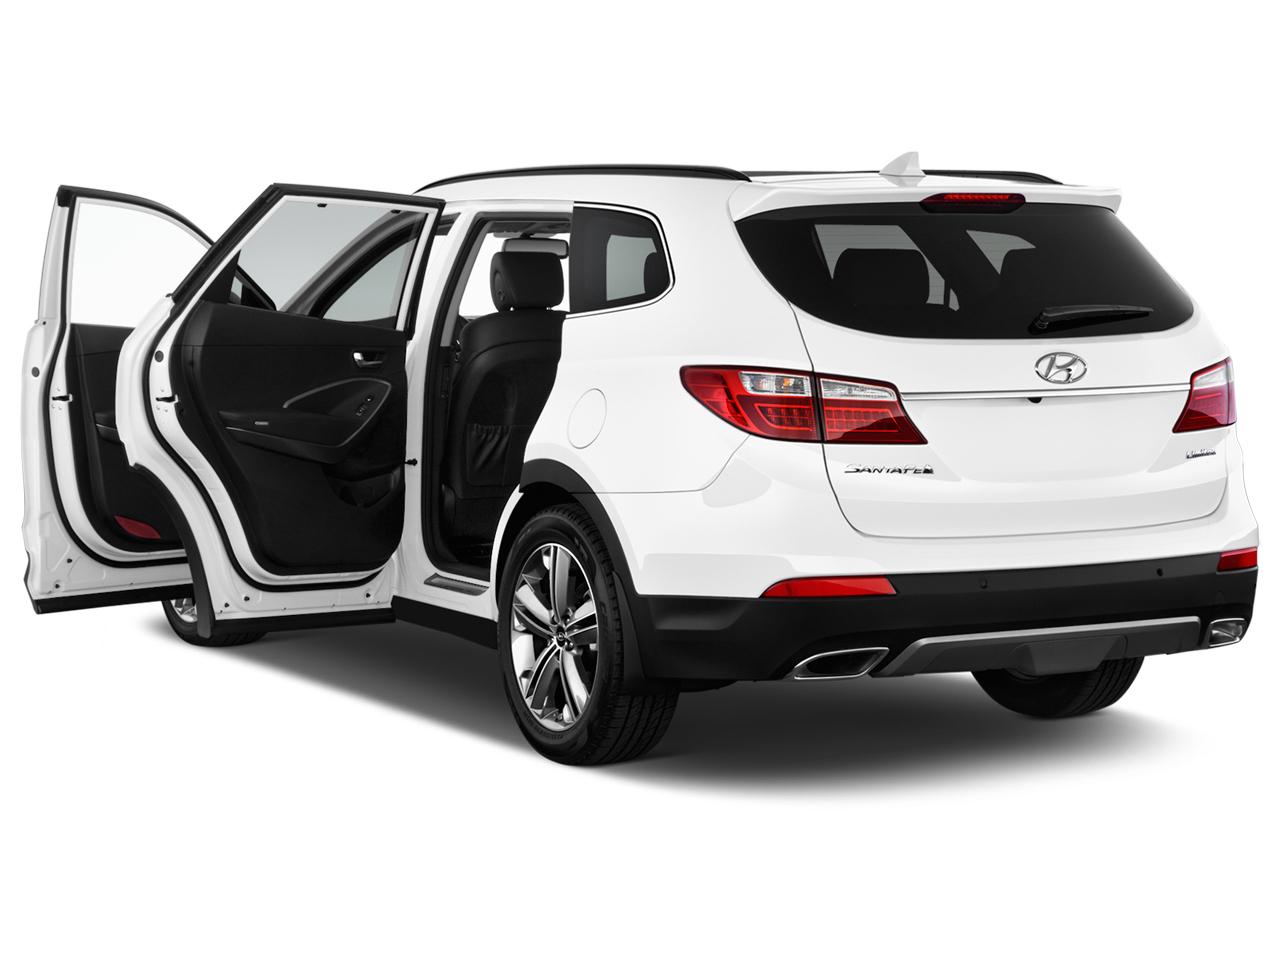 Đánh giá xe Hyundai SantaFe 2016